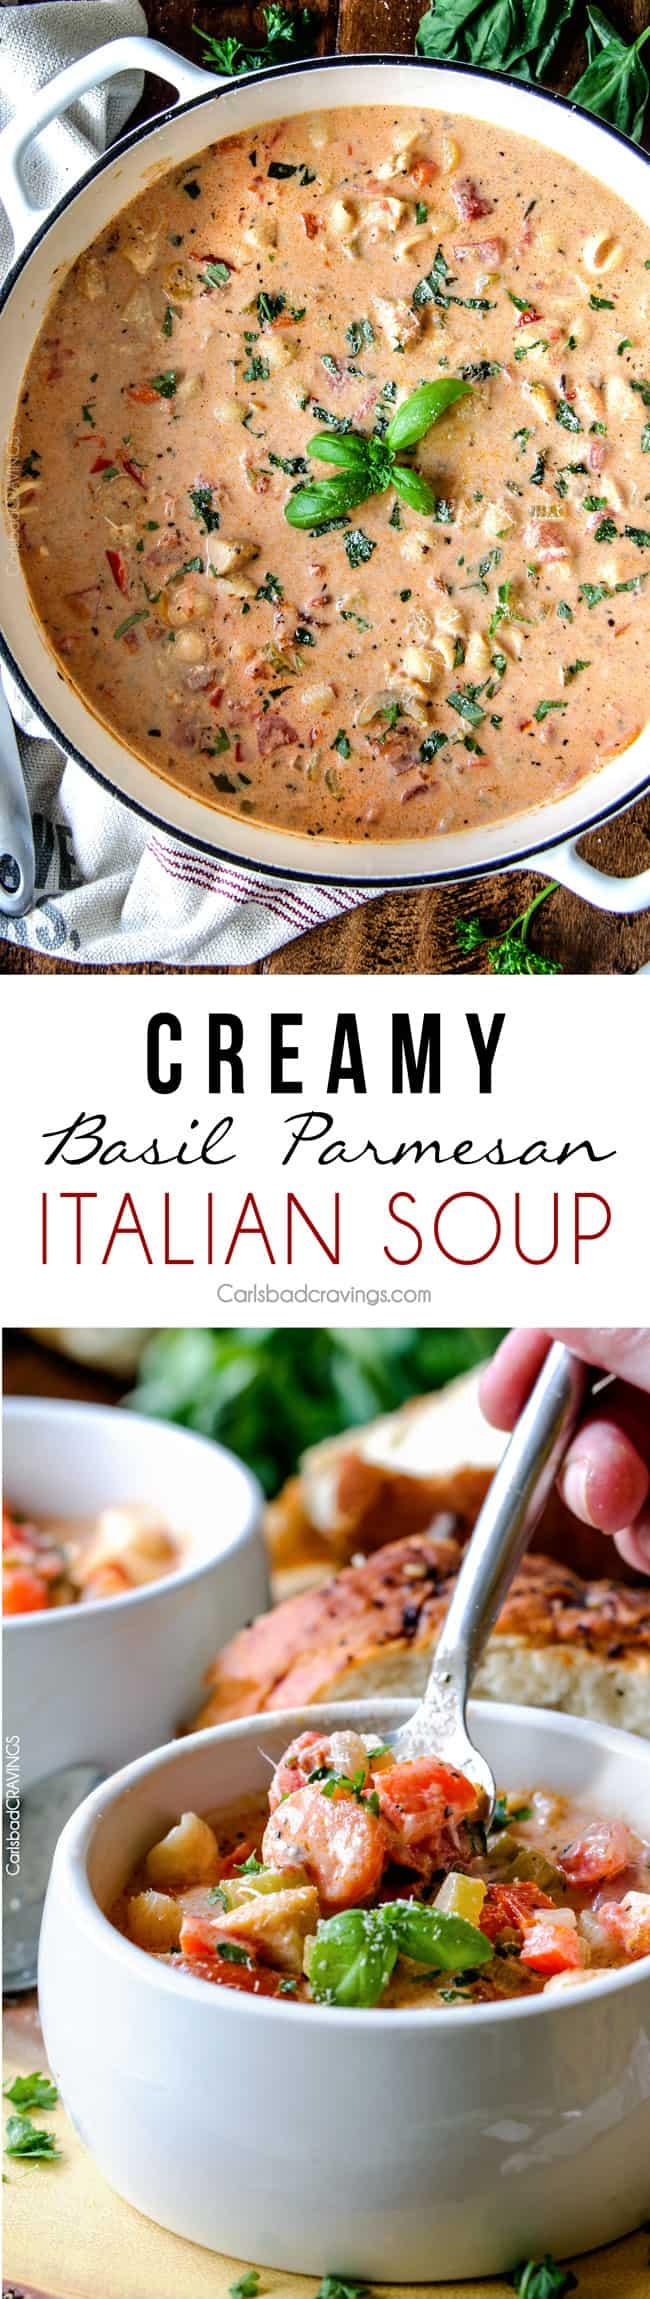 Creamy Basil Parmesan Italian Soup tastes better than any restaurant ...